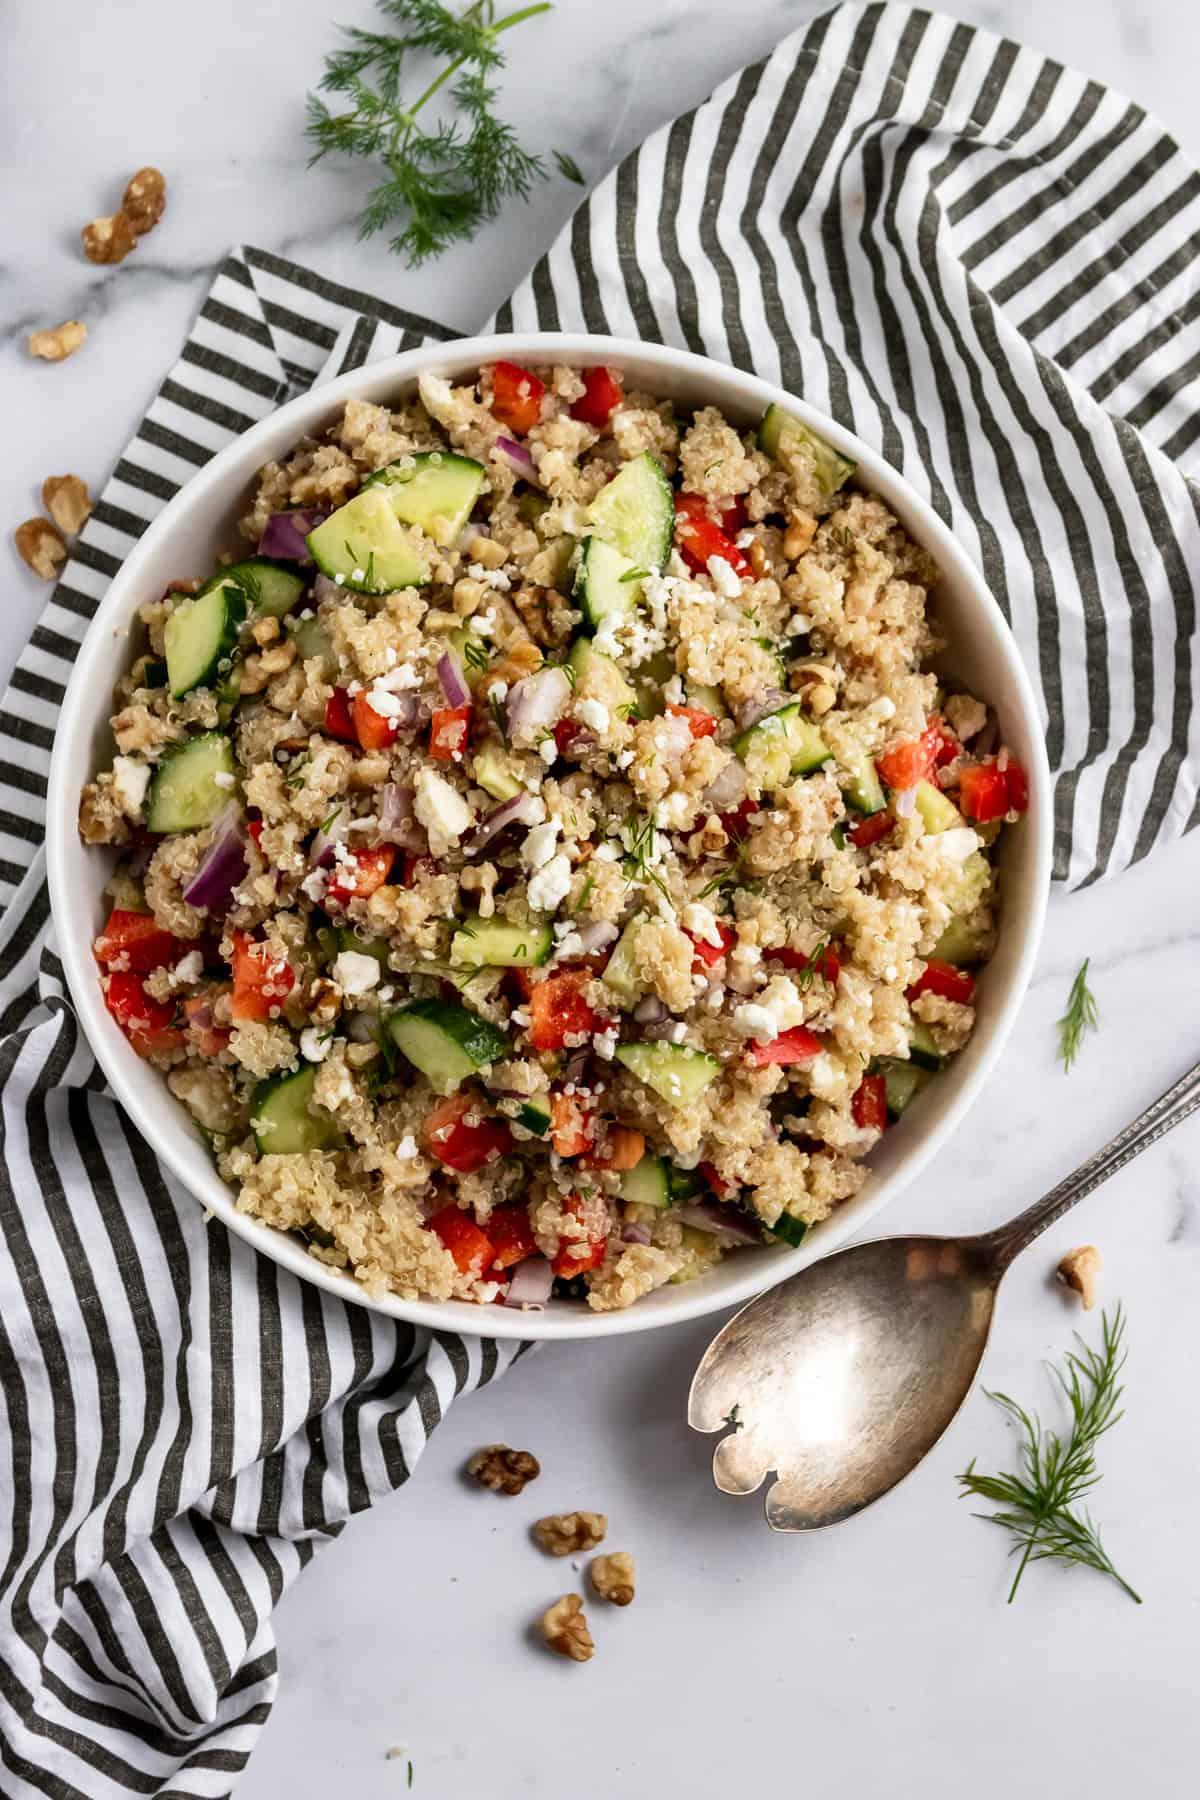 Feta quinoa salad in bowl with serving spoon.